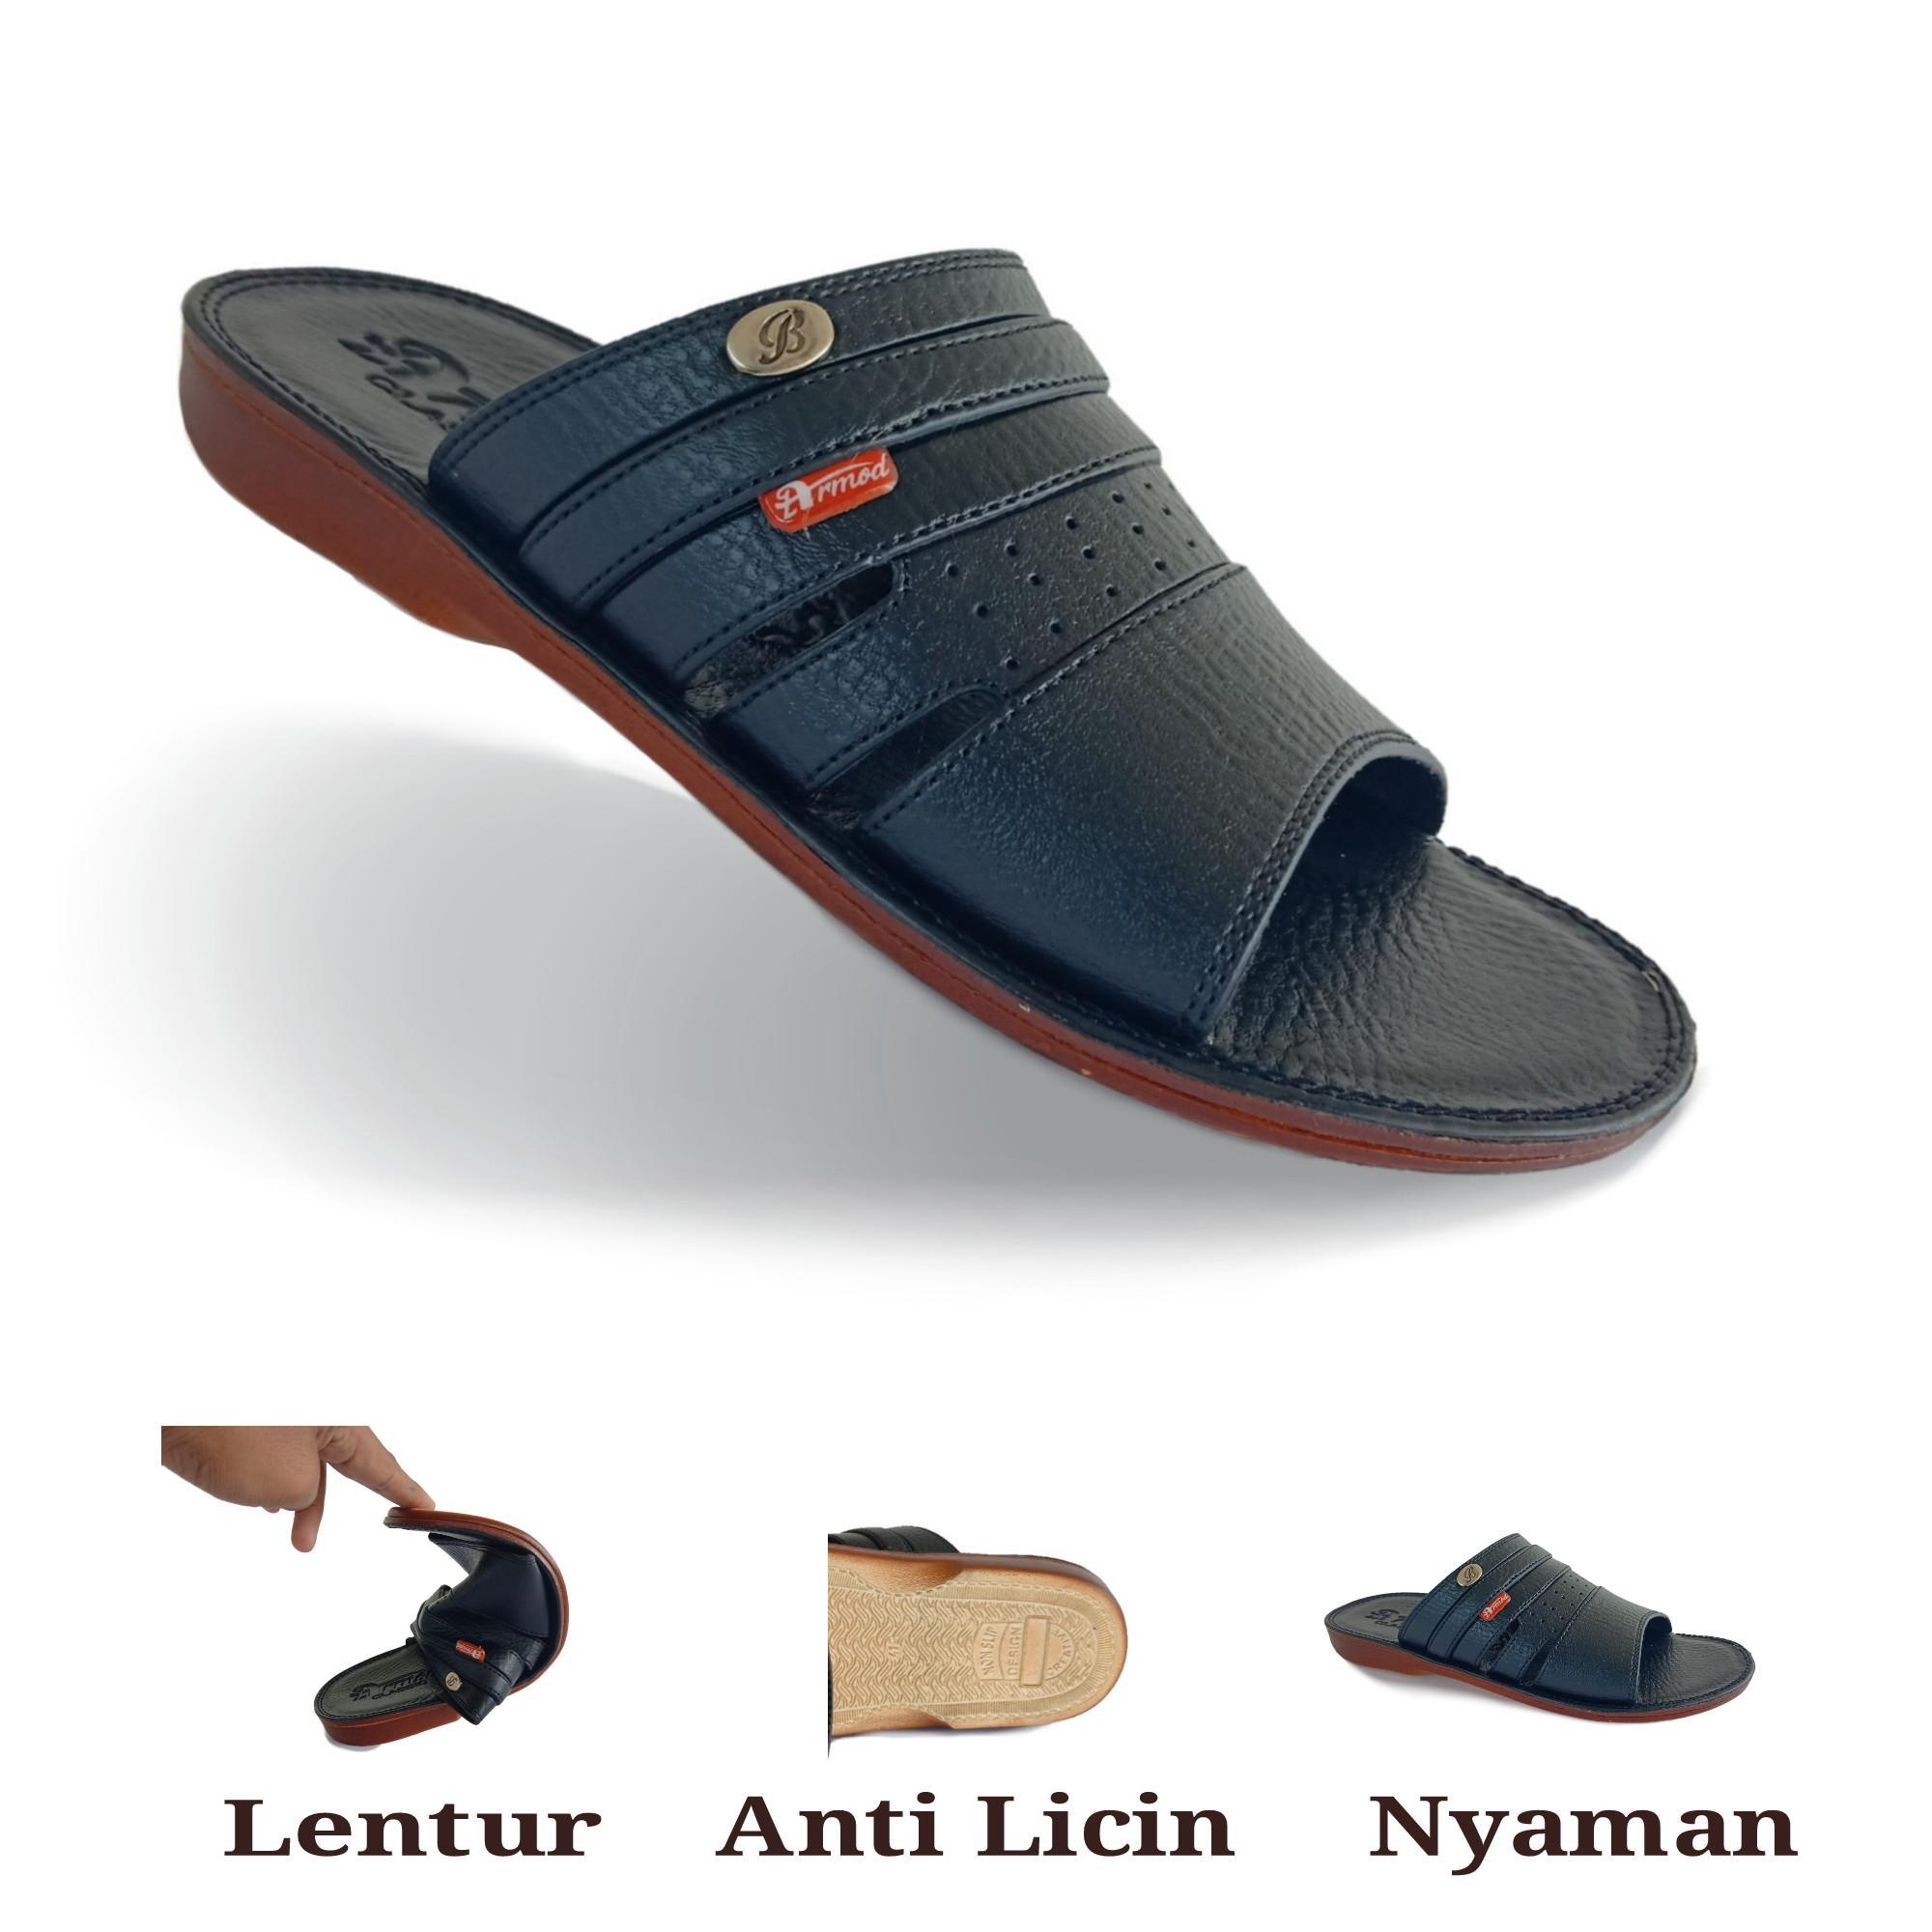 sandal pria dewasa / sandal pria casual / sandal pria casual kulit / sandal pria kulit / sandal pria lentur / armod sbr 053